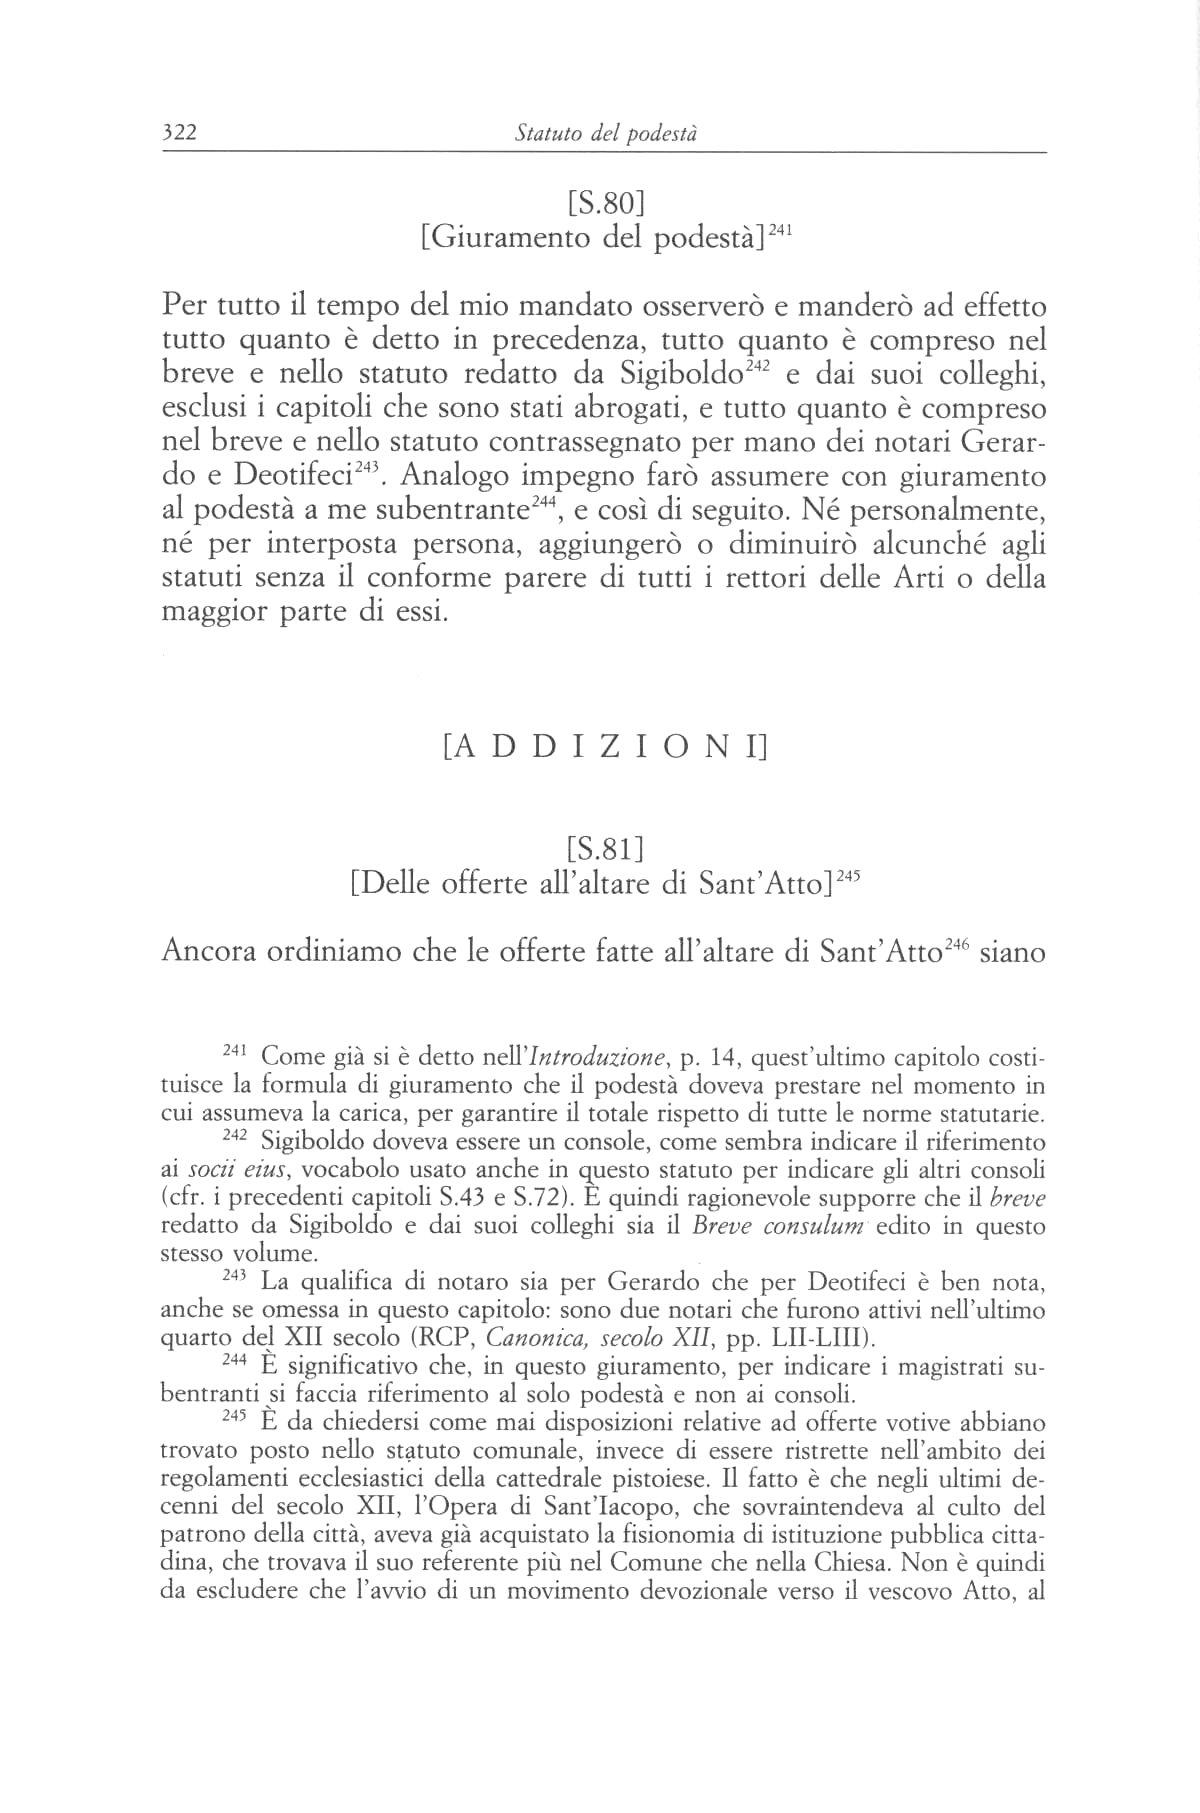 statuti pistoiesi del sec.XII 0322.jpg